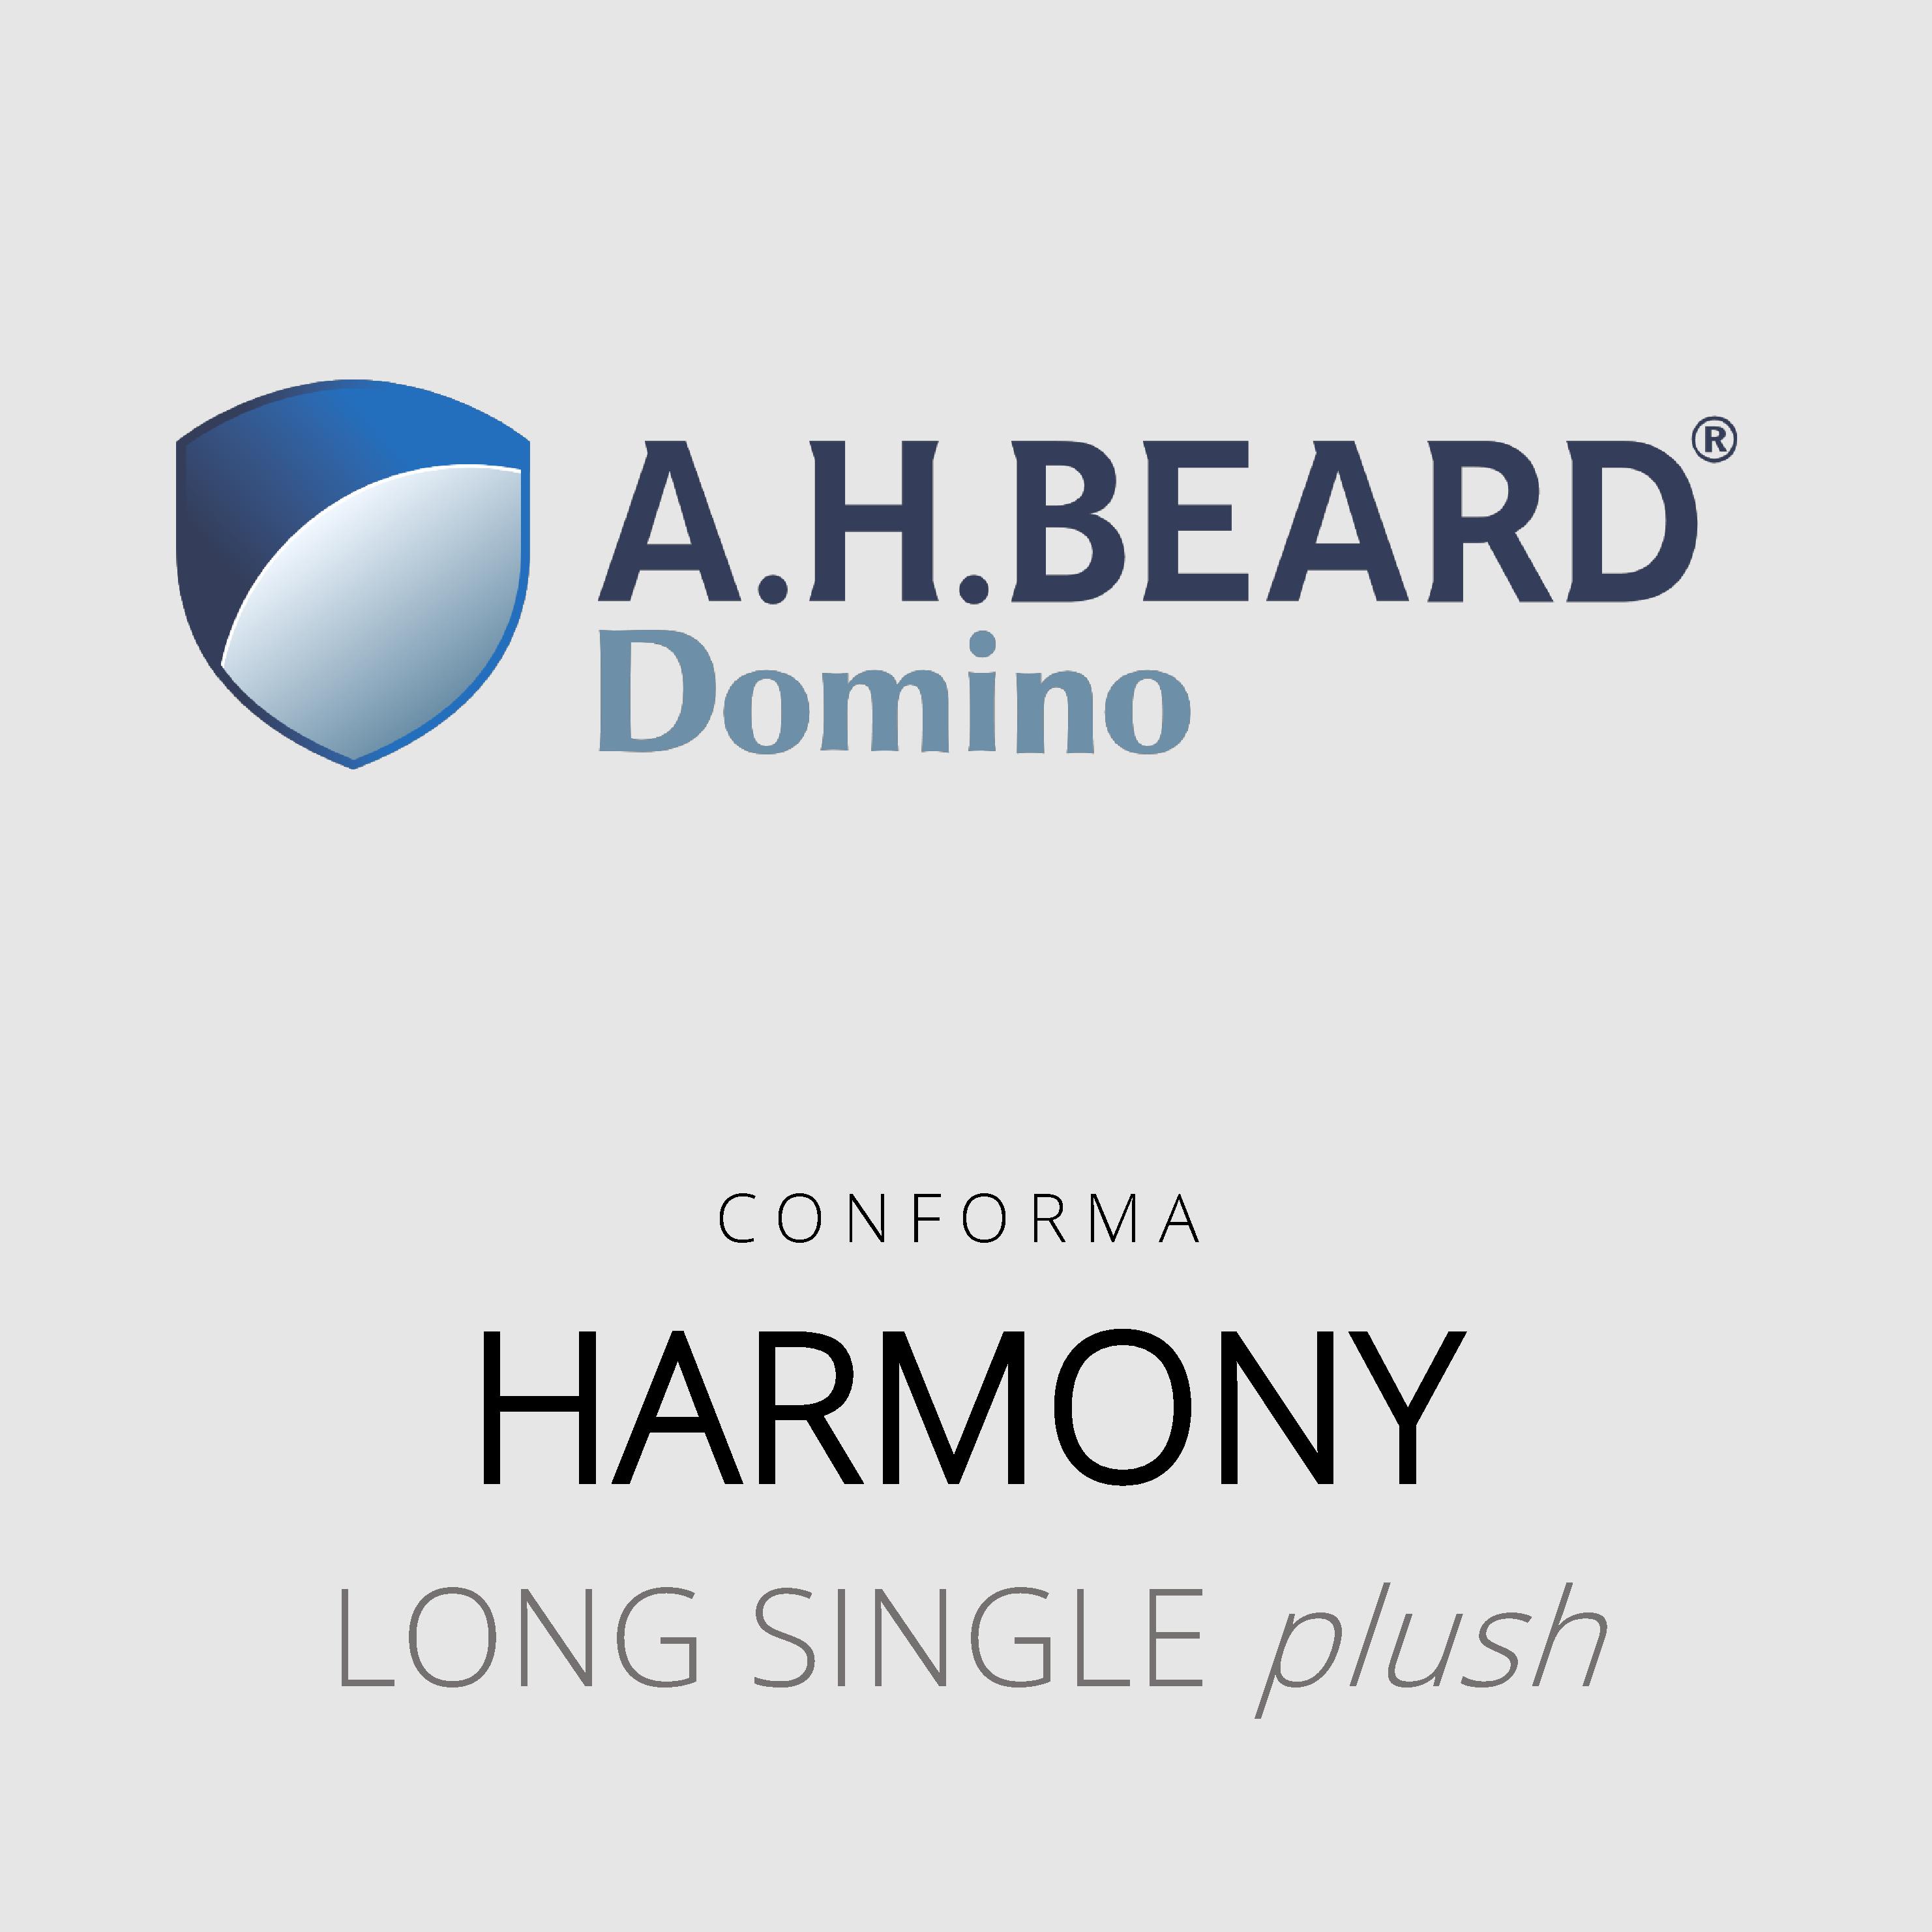 AH Beard Domino – Harmony – Conforma – Long Single Plush Mattress